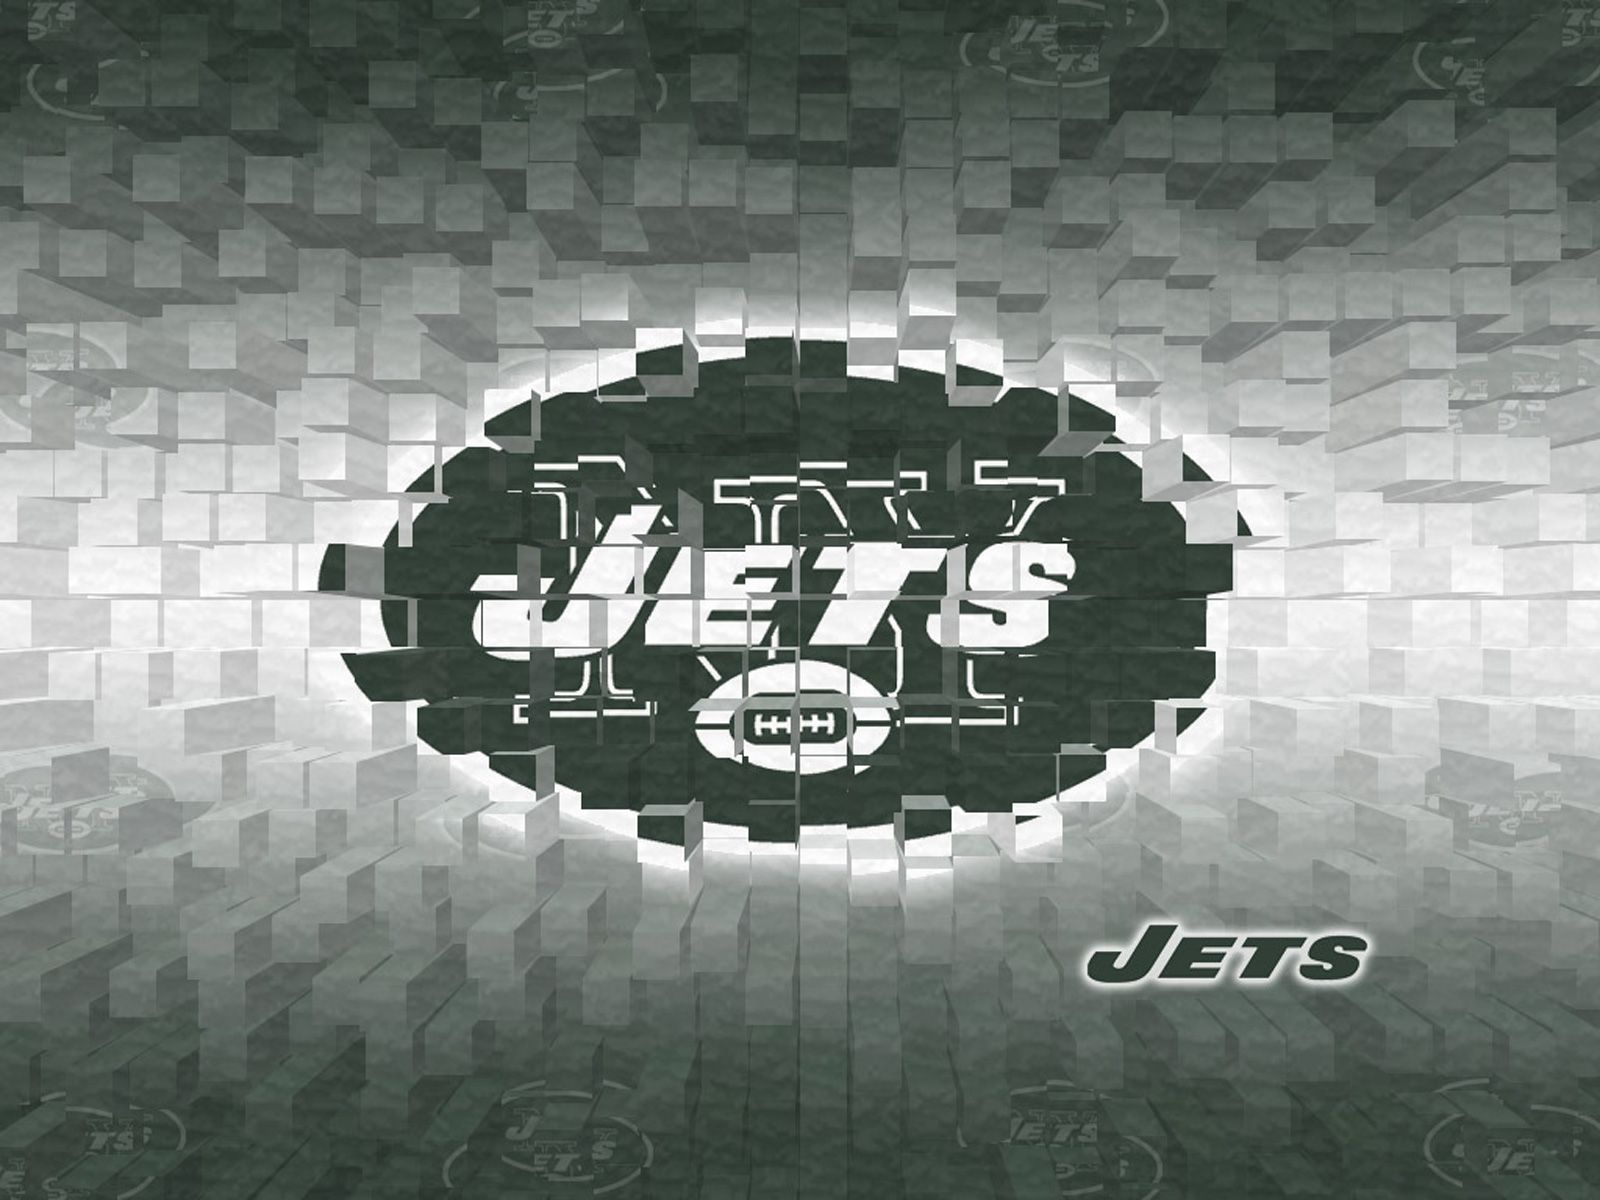 New York Jet S Wallpaper New York Jets New York Jets Football